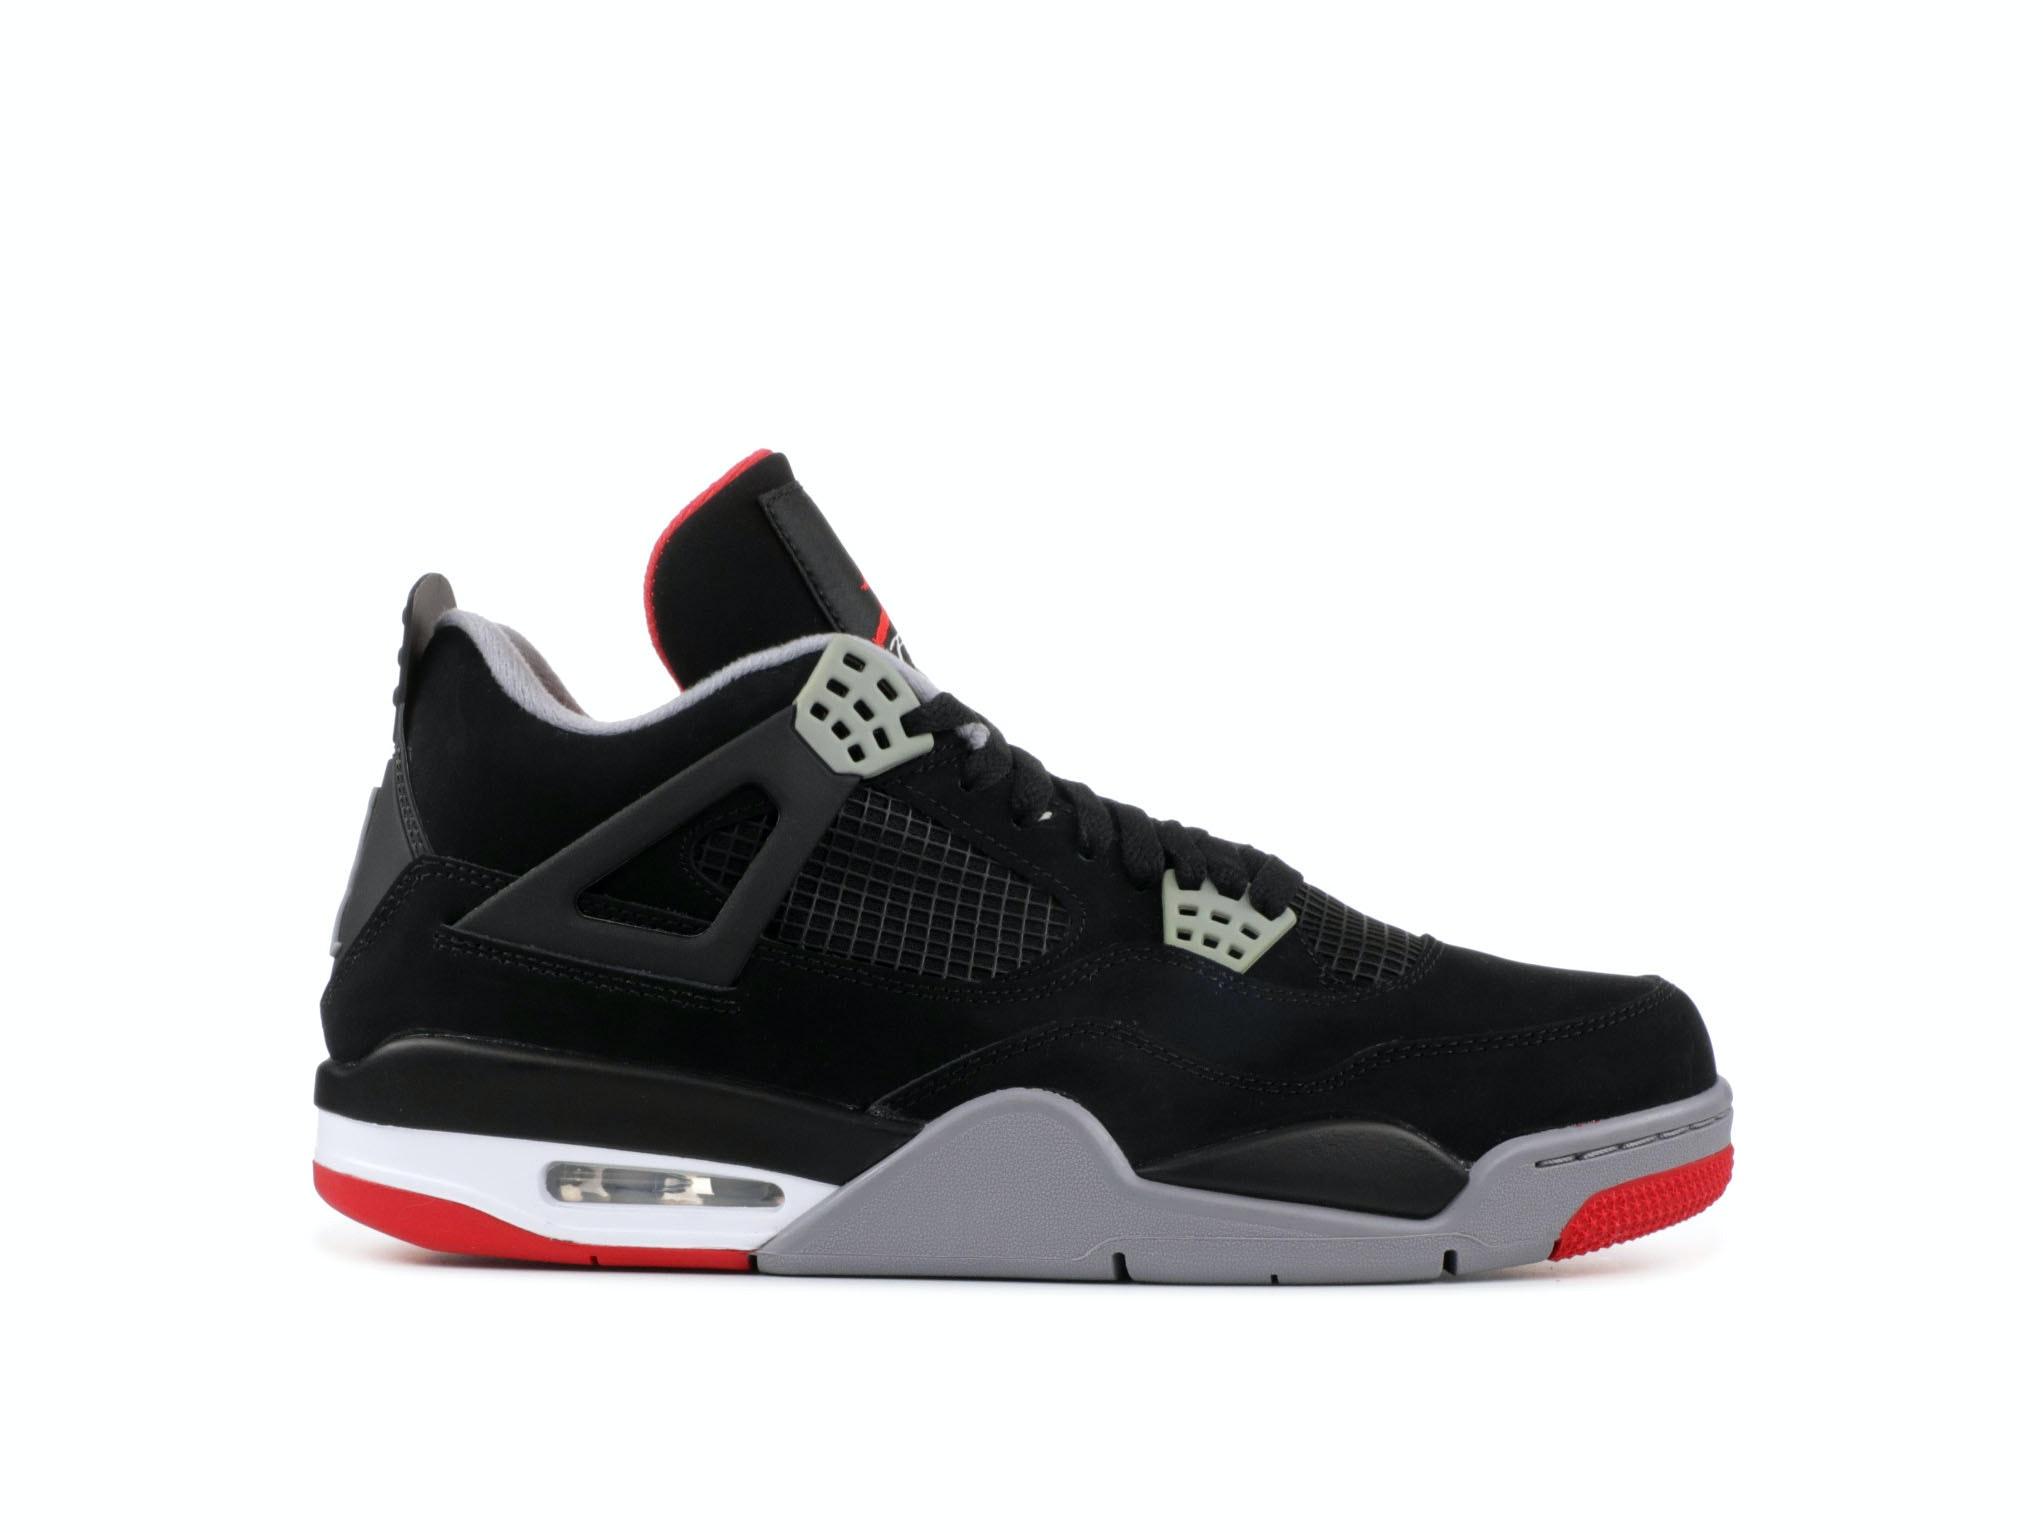 watch d403b d9ab4 Air Jordan 4 Retro Bred 2012